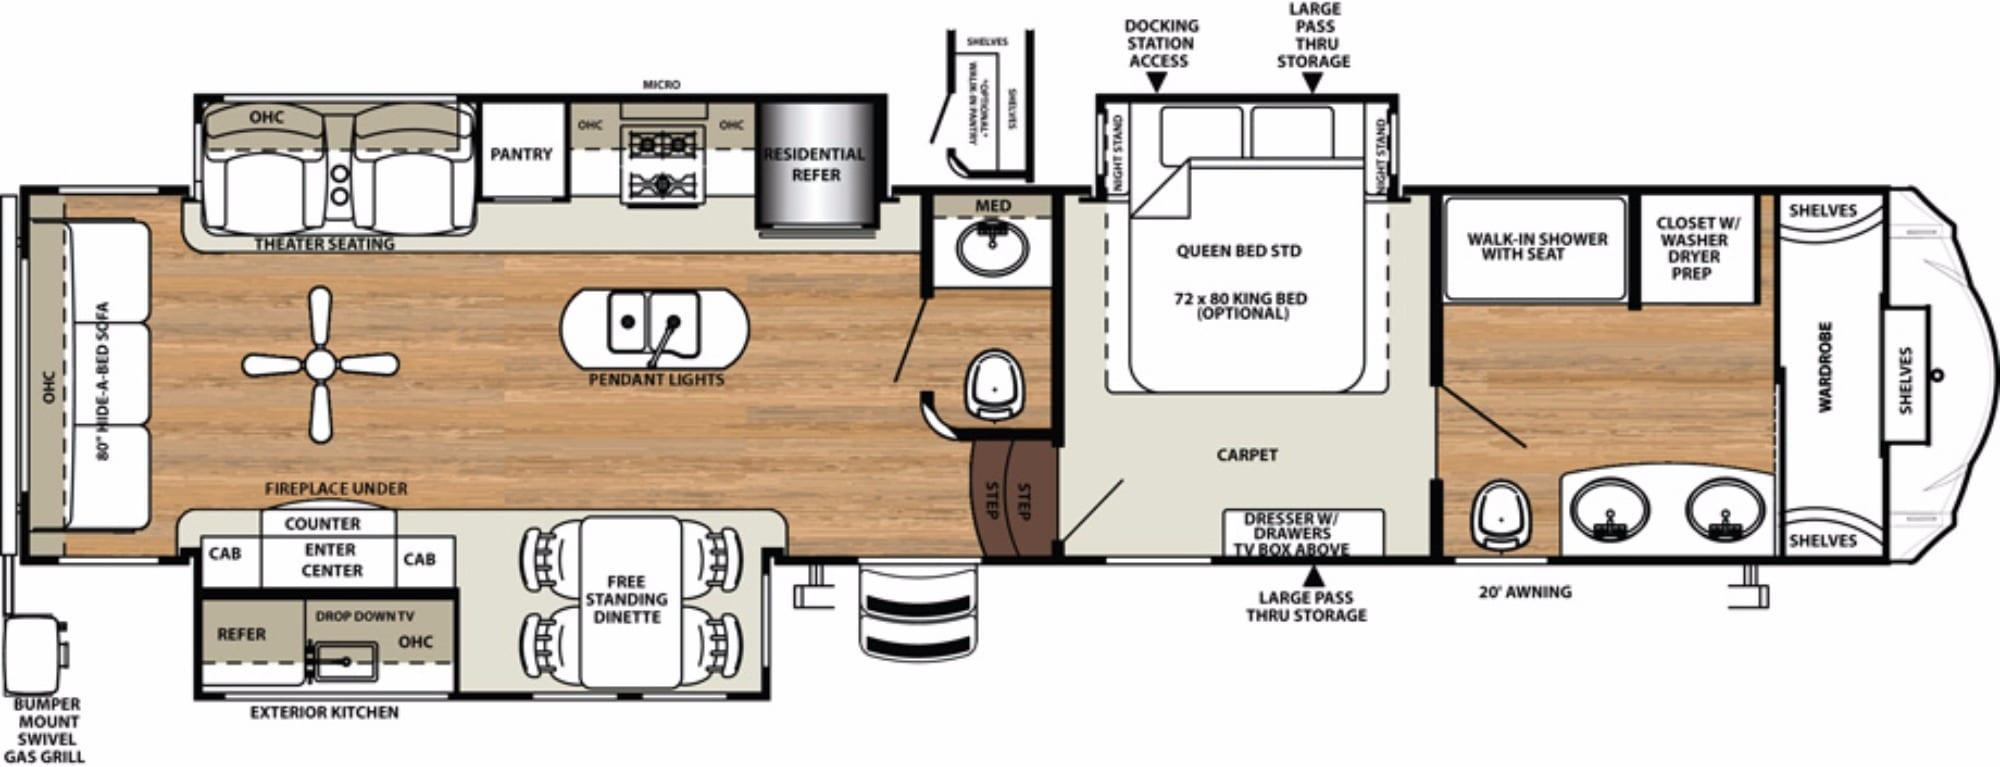 hardwood floor repair birmingham al of forest river sandpiper rvs for sale camping world rv sales throughout bedroom